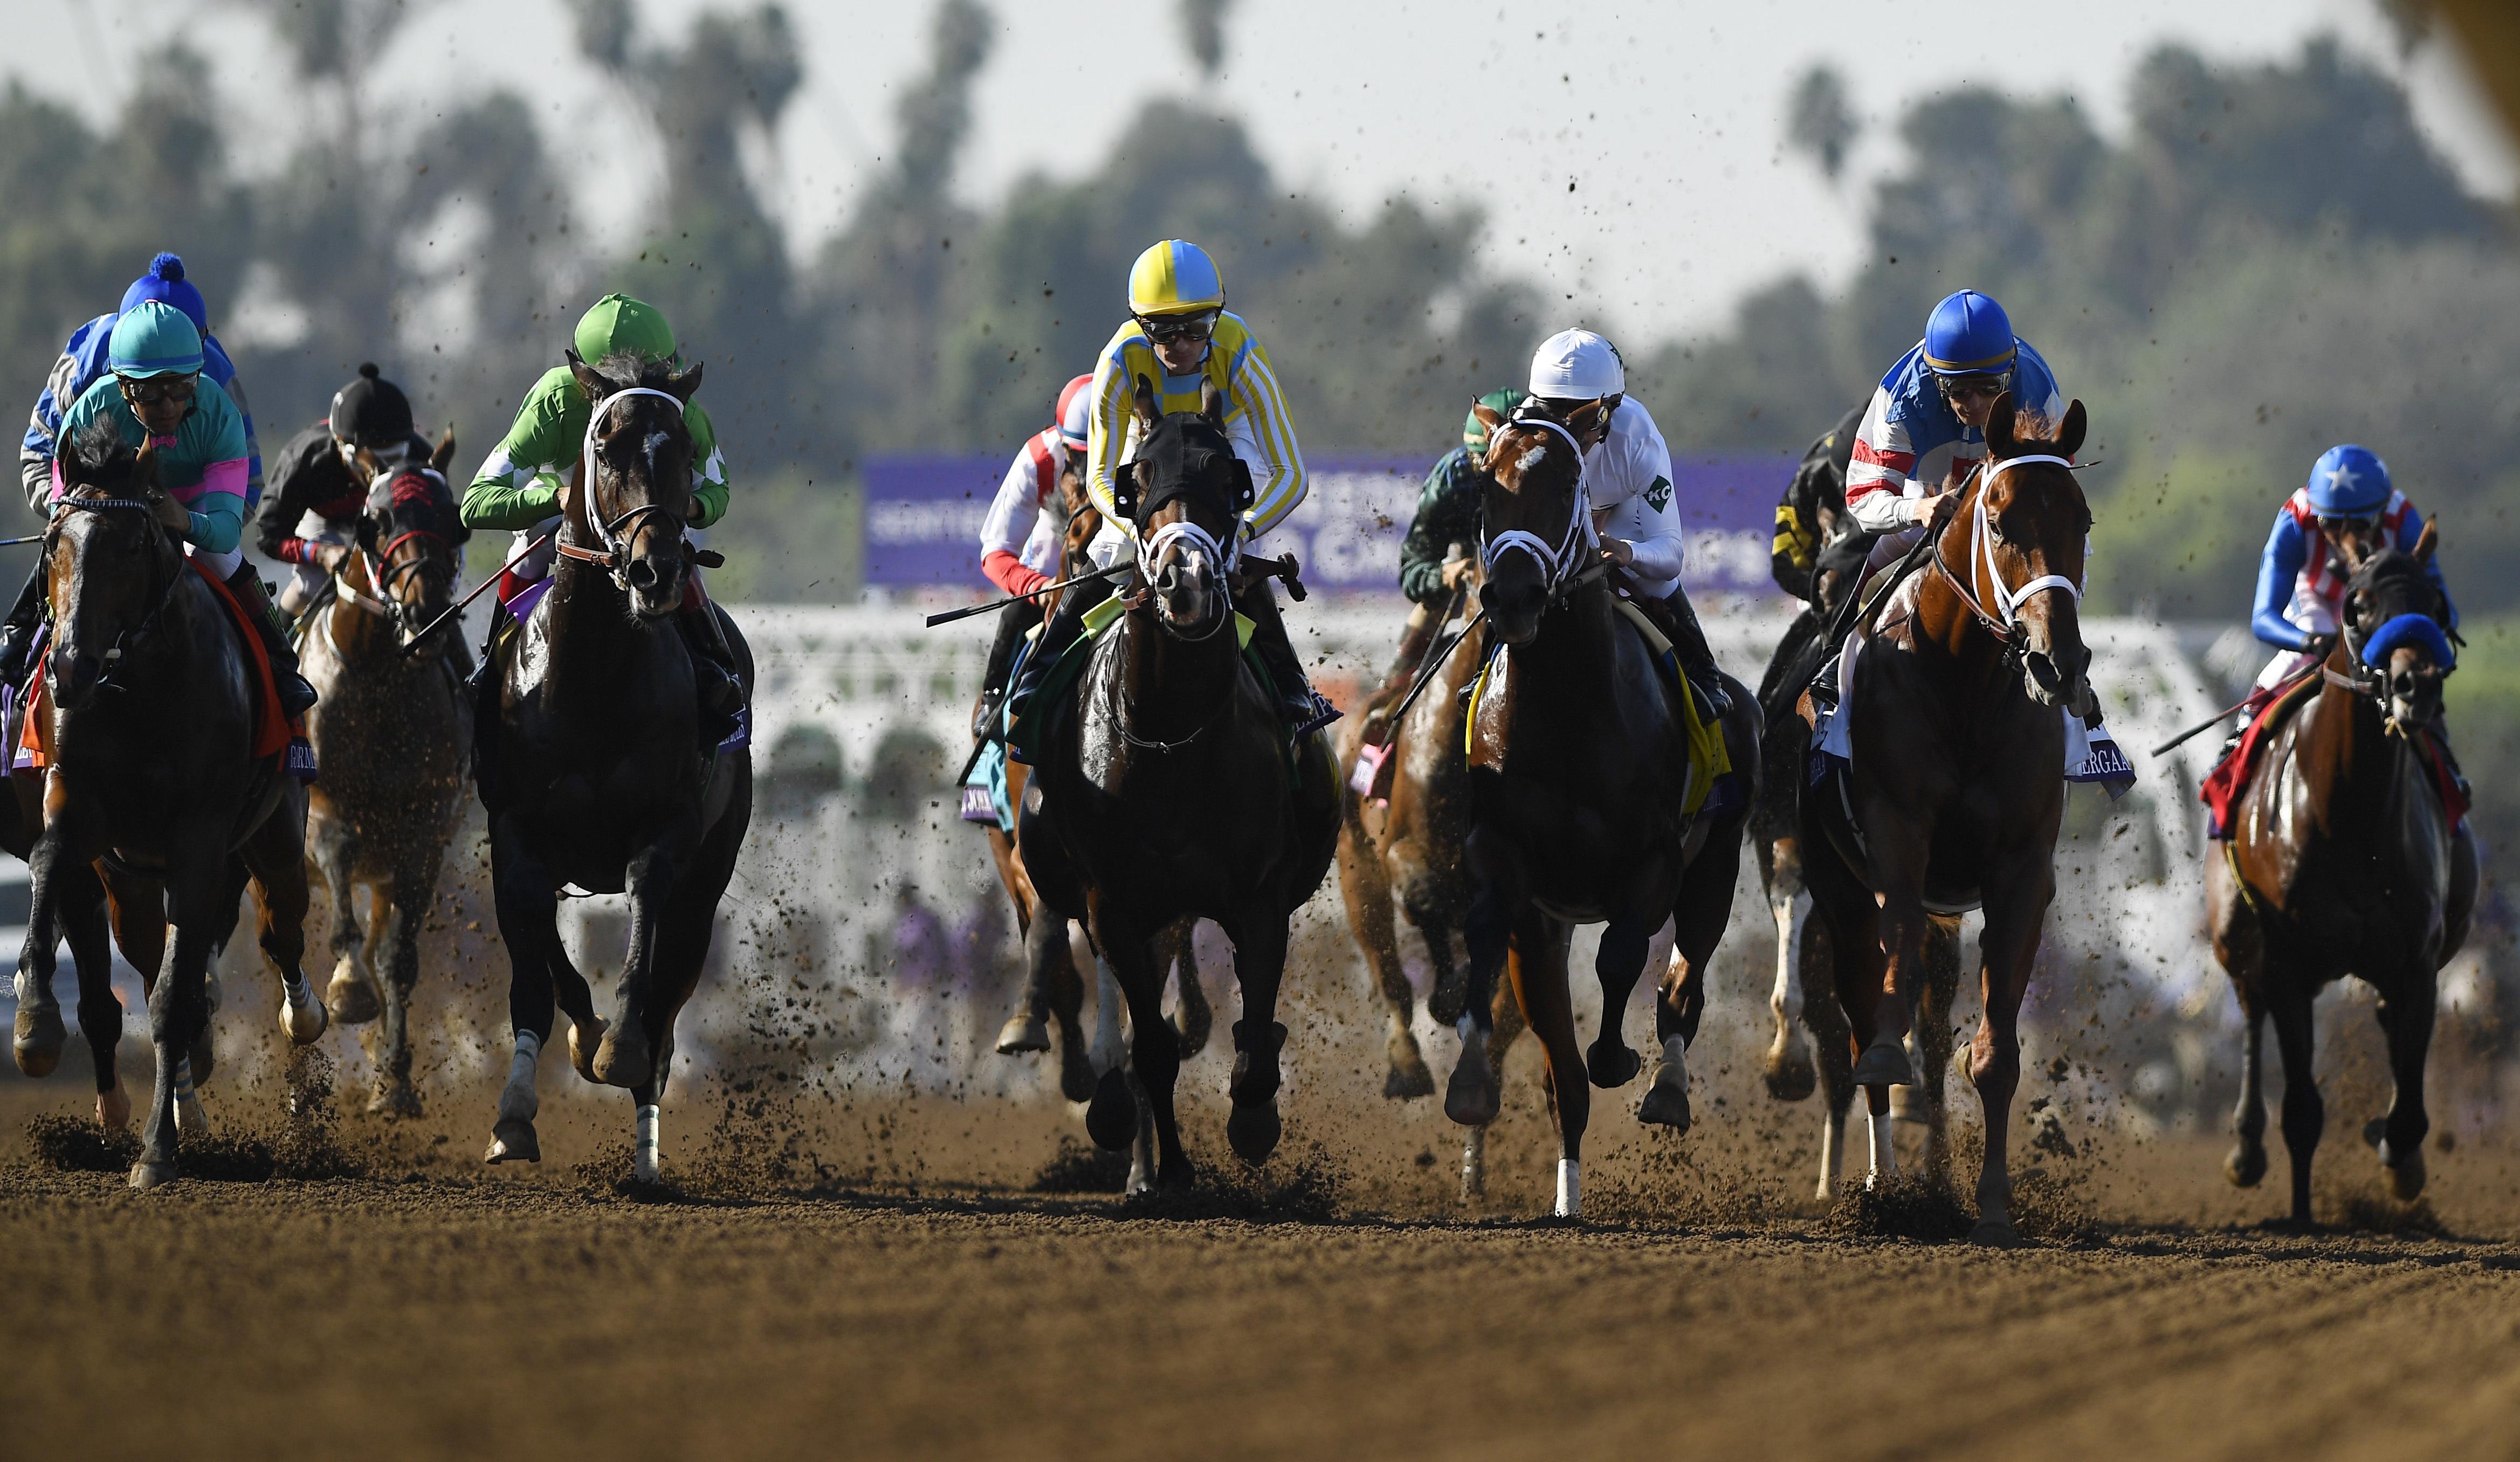 Julien Velasquez, center, rides Classic Empire to victory in the Breeders' Cup Juvenile horse race at Santa Anita, Saturday, Nov. 5, 2016, in Arcadia, Calif. (AP Photo/Mark J. Terrill)